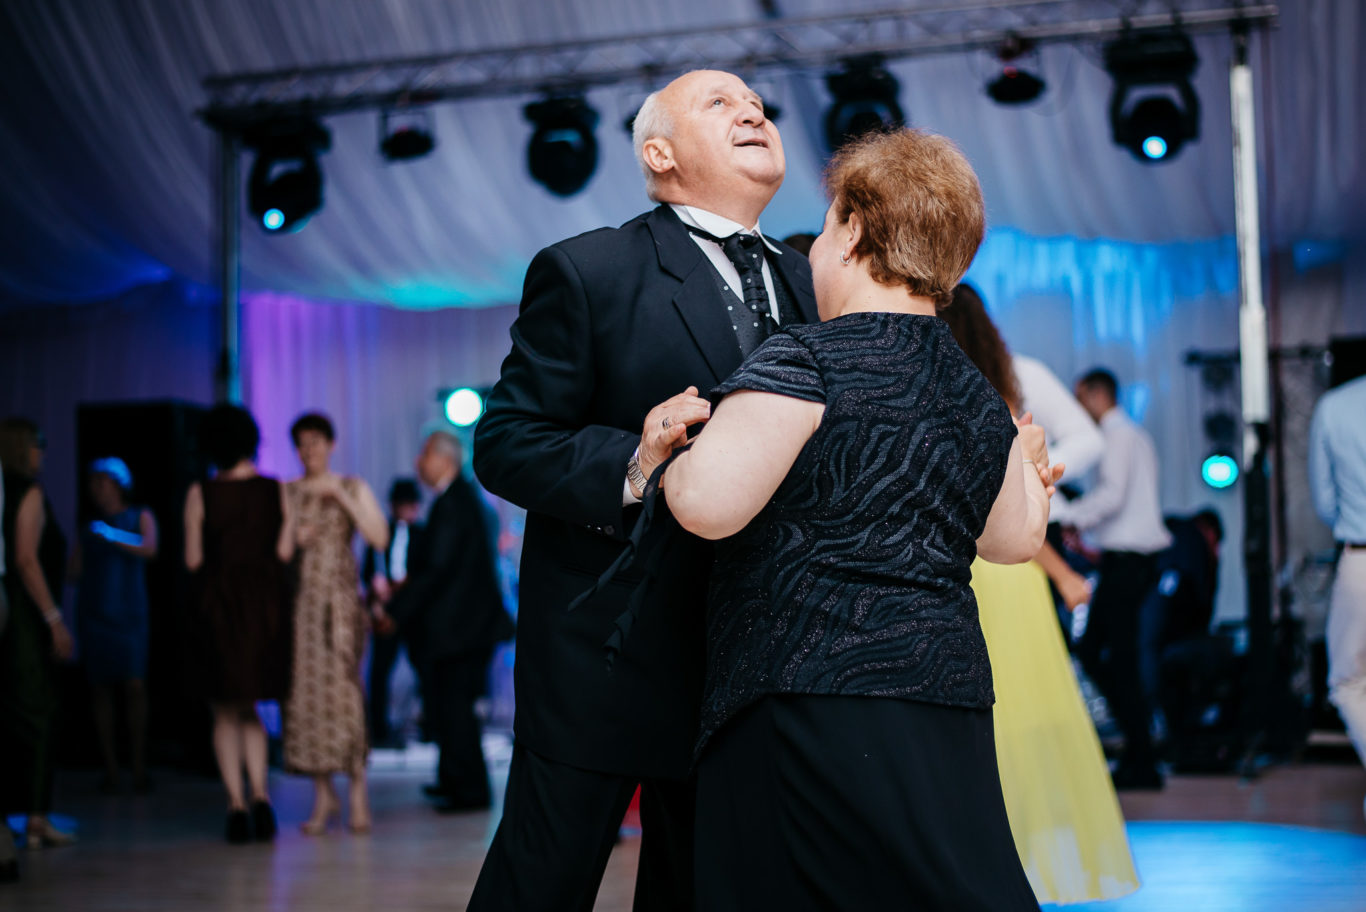 0518-Fotografie-nunta-Stirbey-Laura-Rares-fotograf-Ciprian-Dumitrescu-DSC_7295